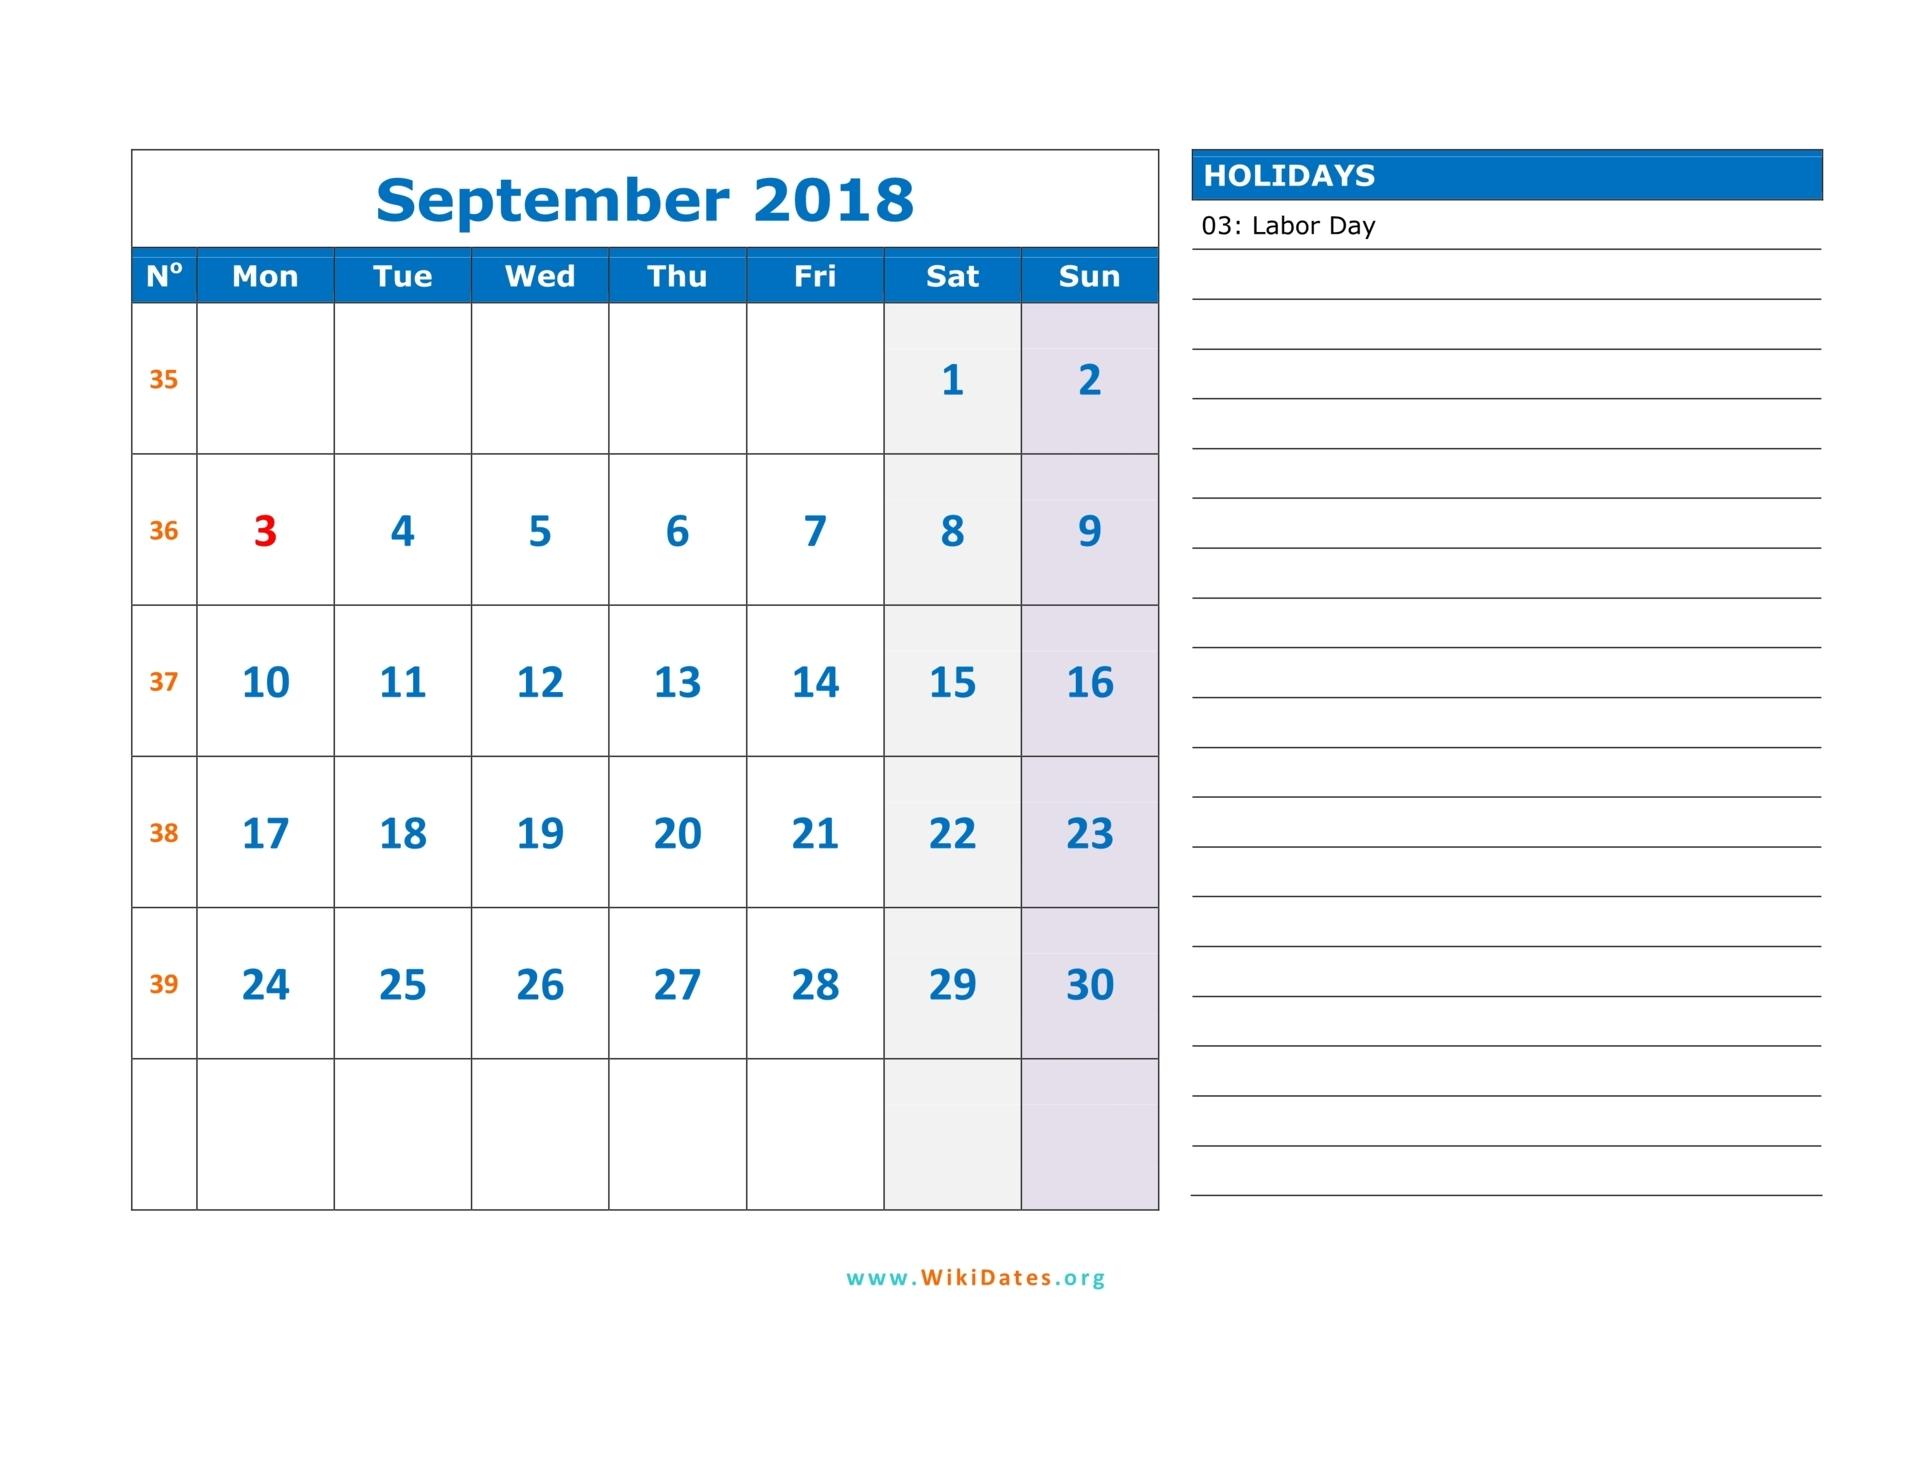 September 2018 Calendar | WikiDates.org